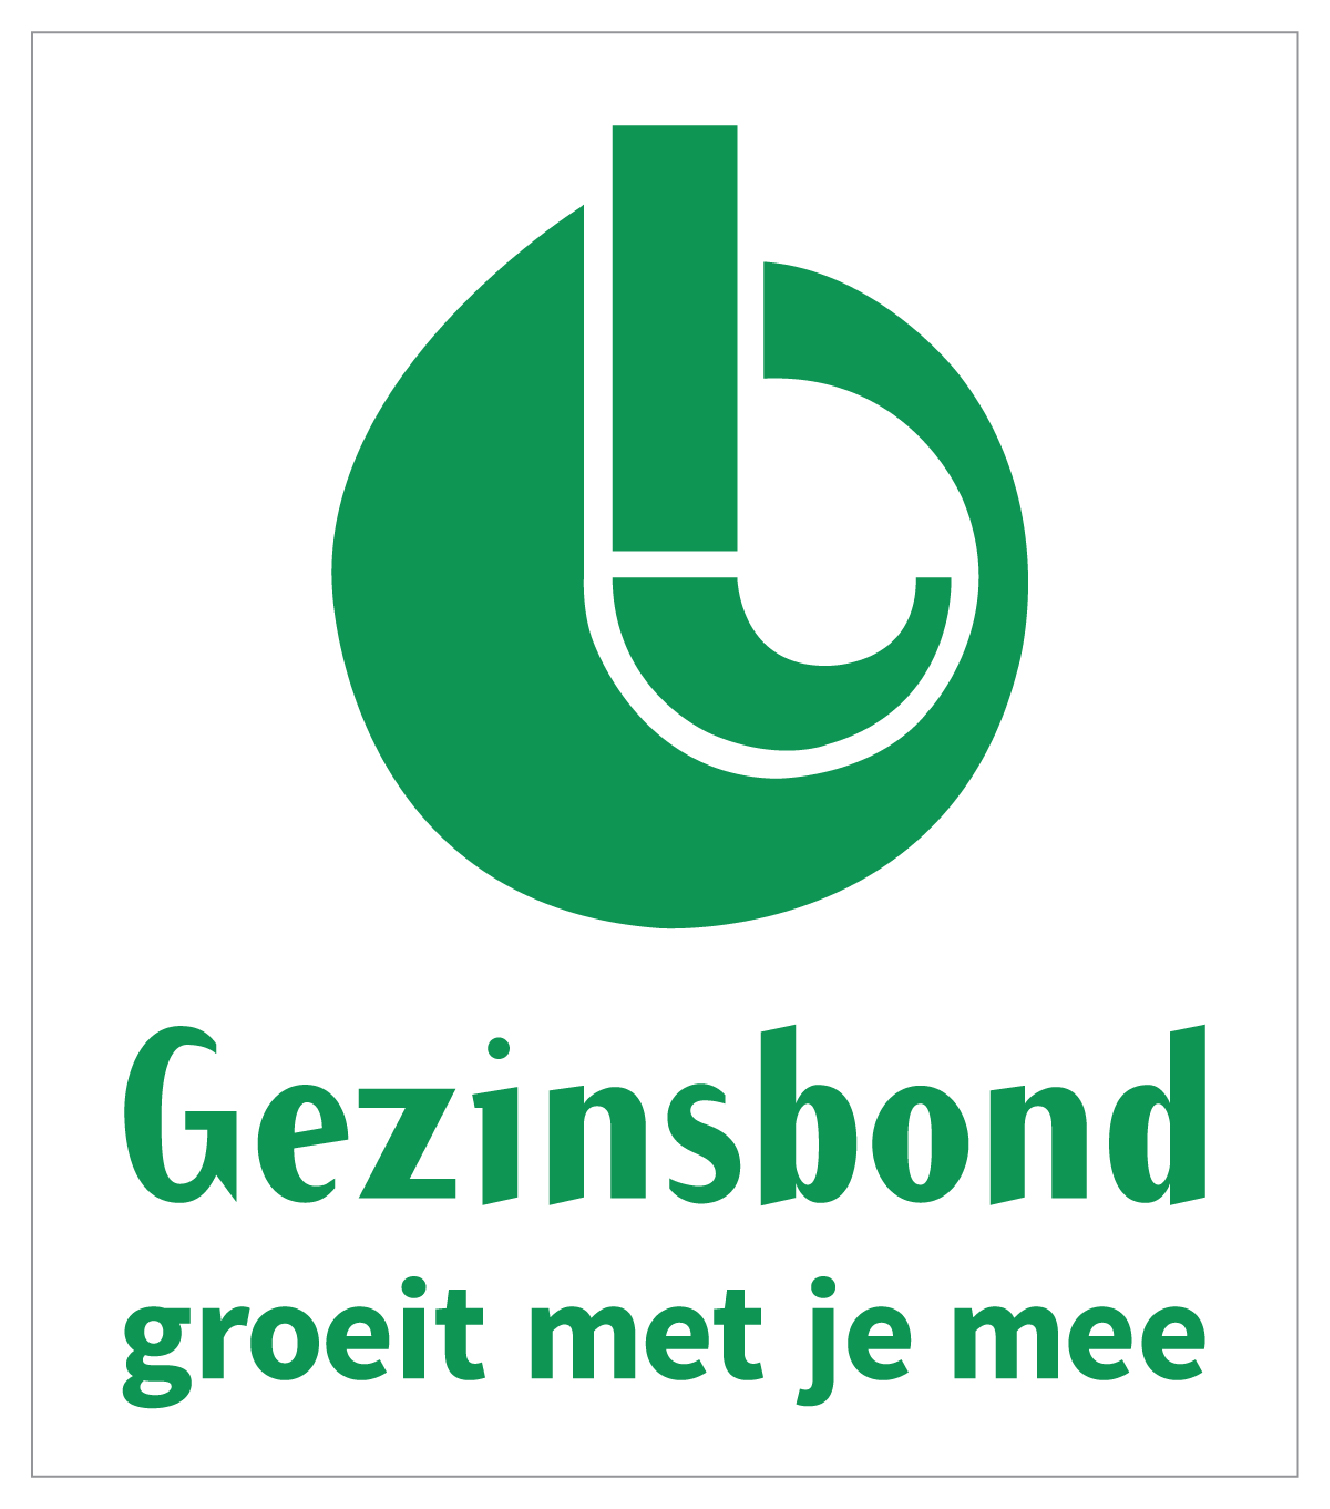 Logos_Gezinsbond-01.jpg